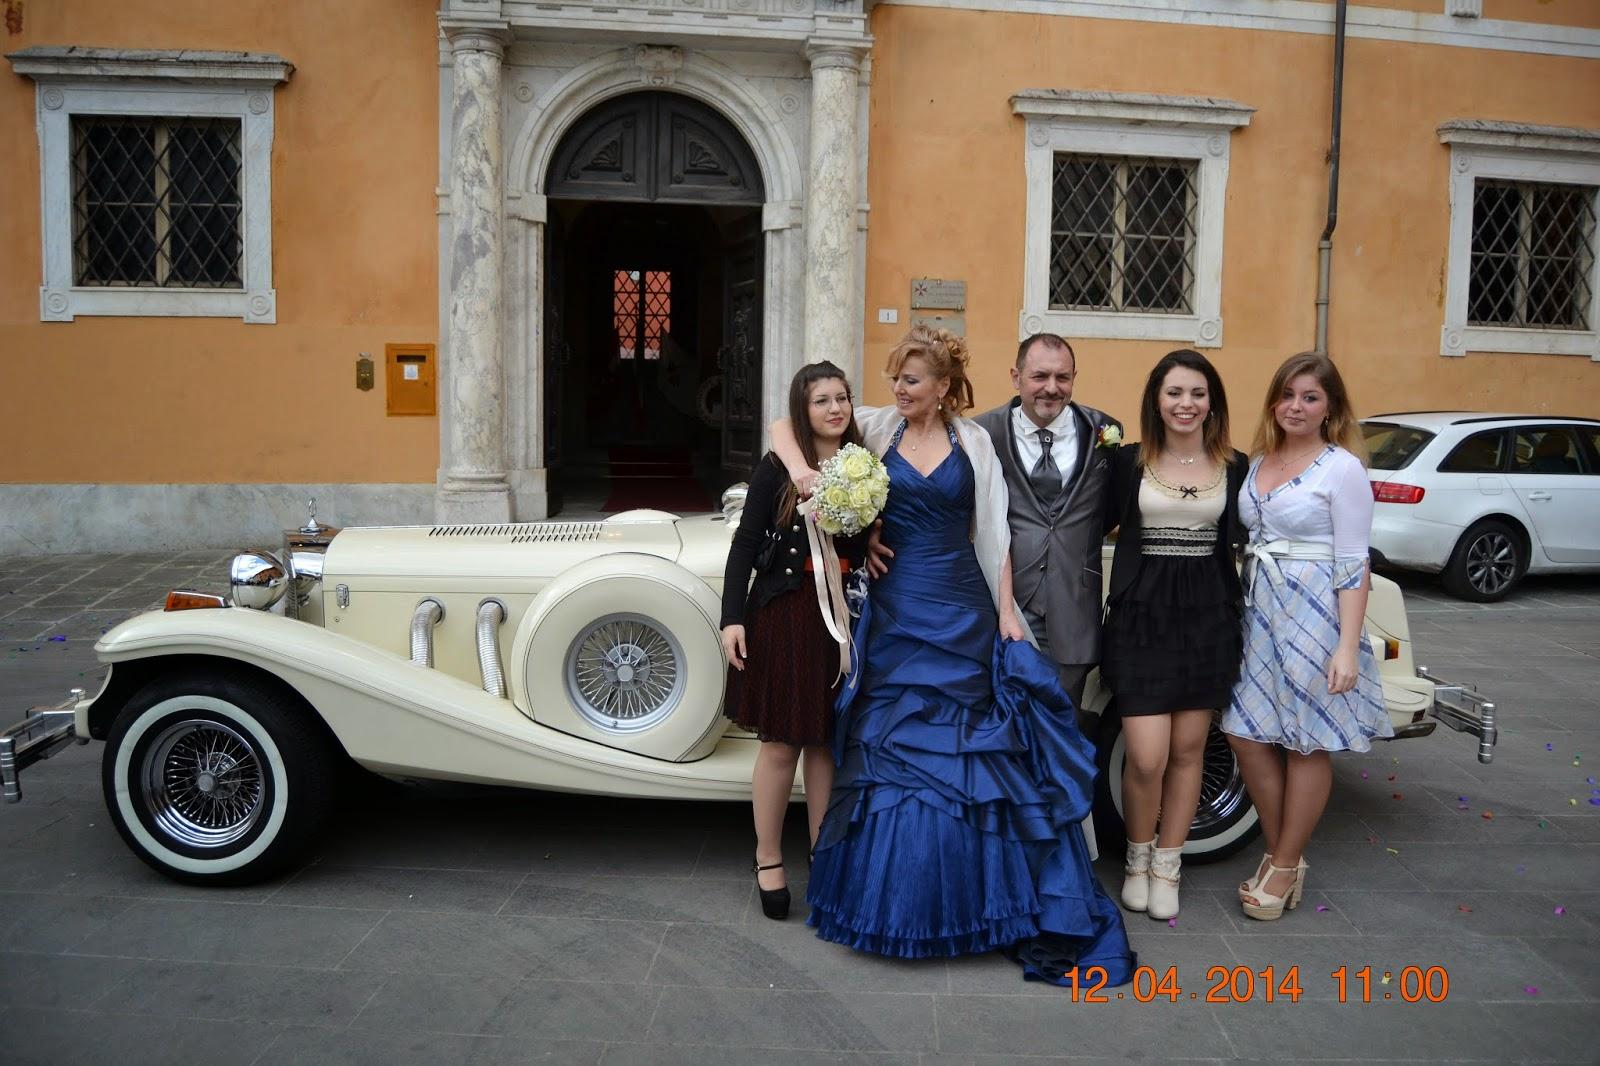 Wedding princess @ Pisa